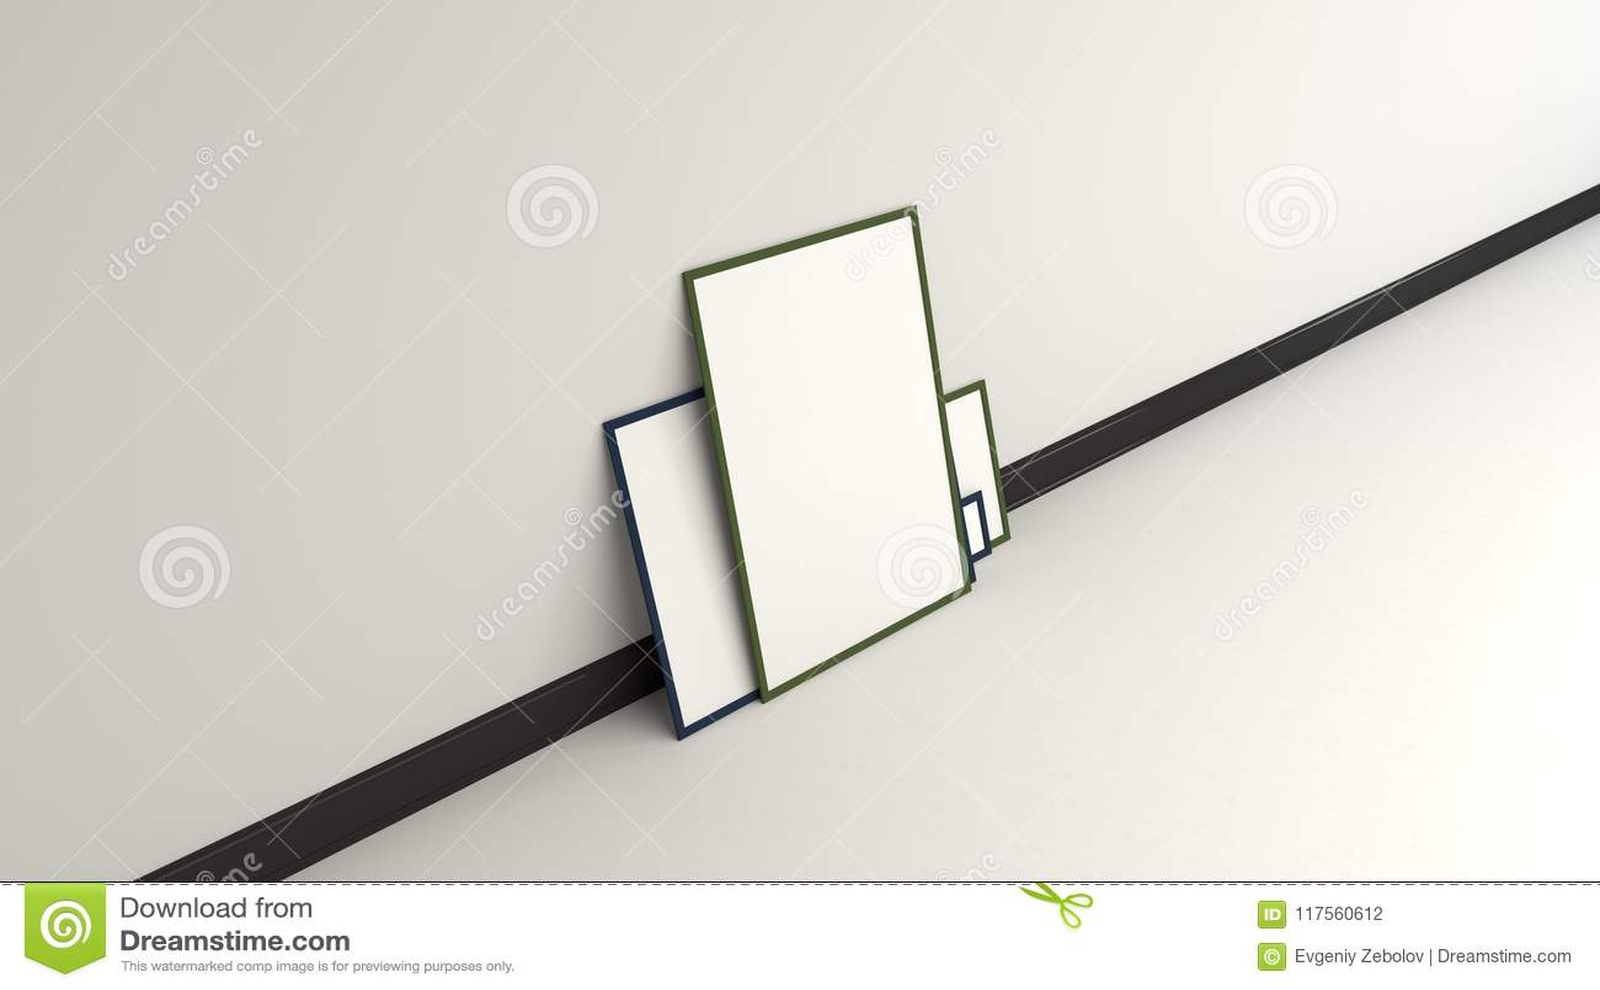 Blank White Posters In Black Frames Standing On The Floor Stock ...